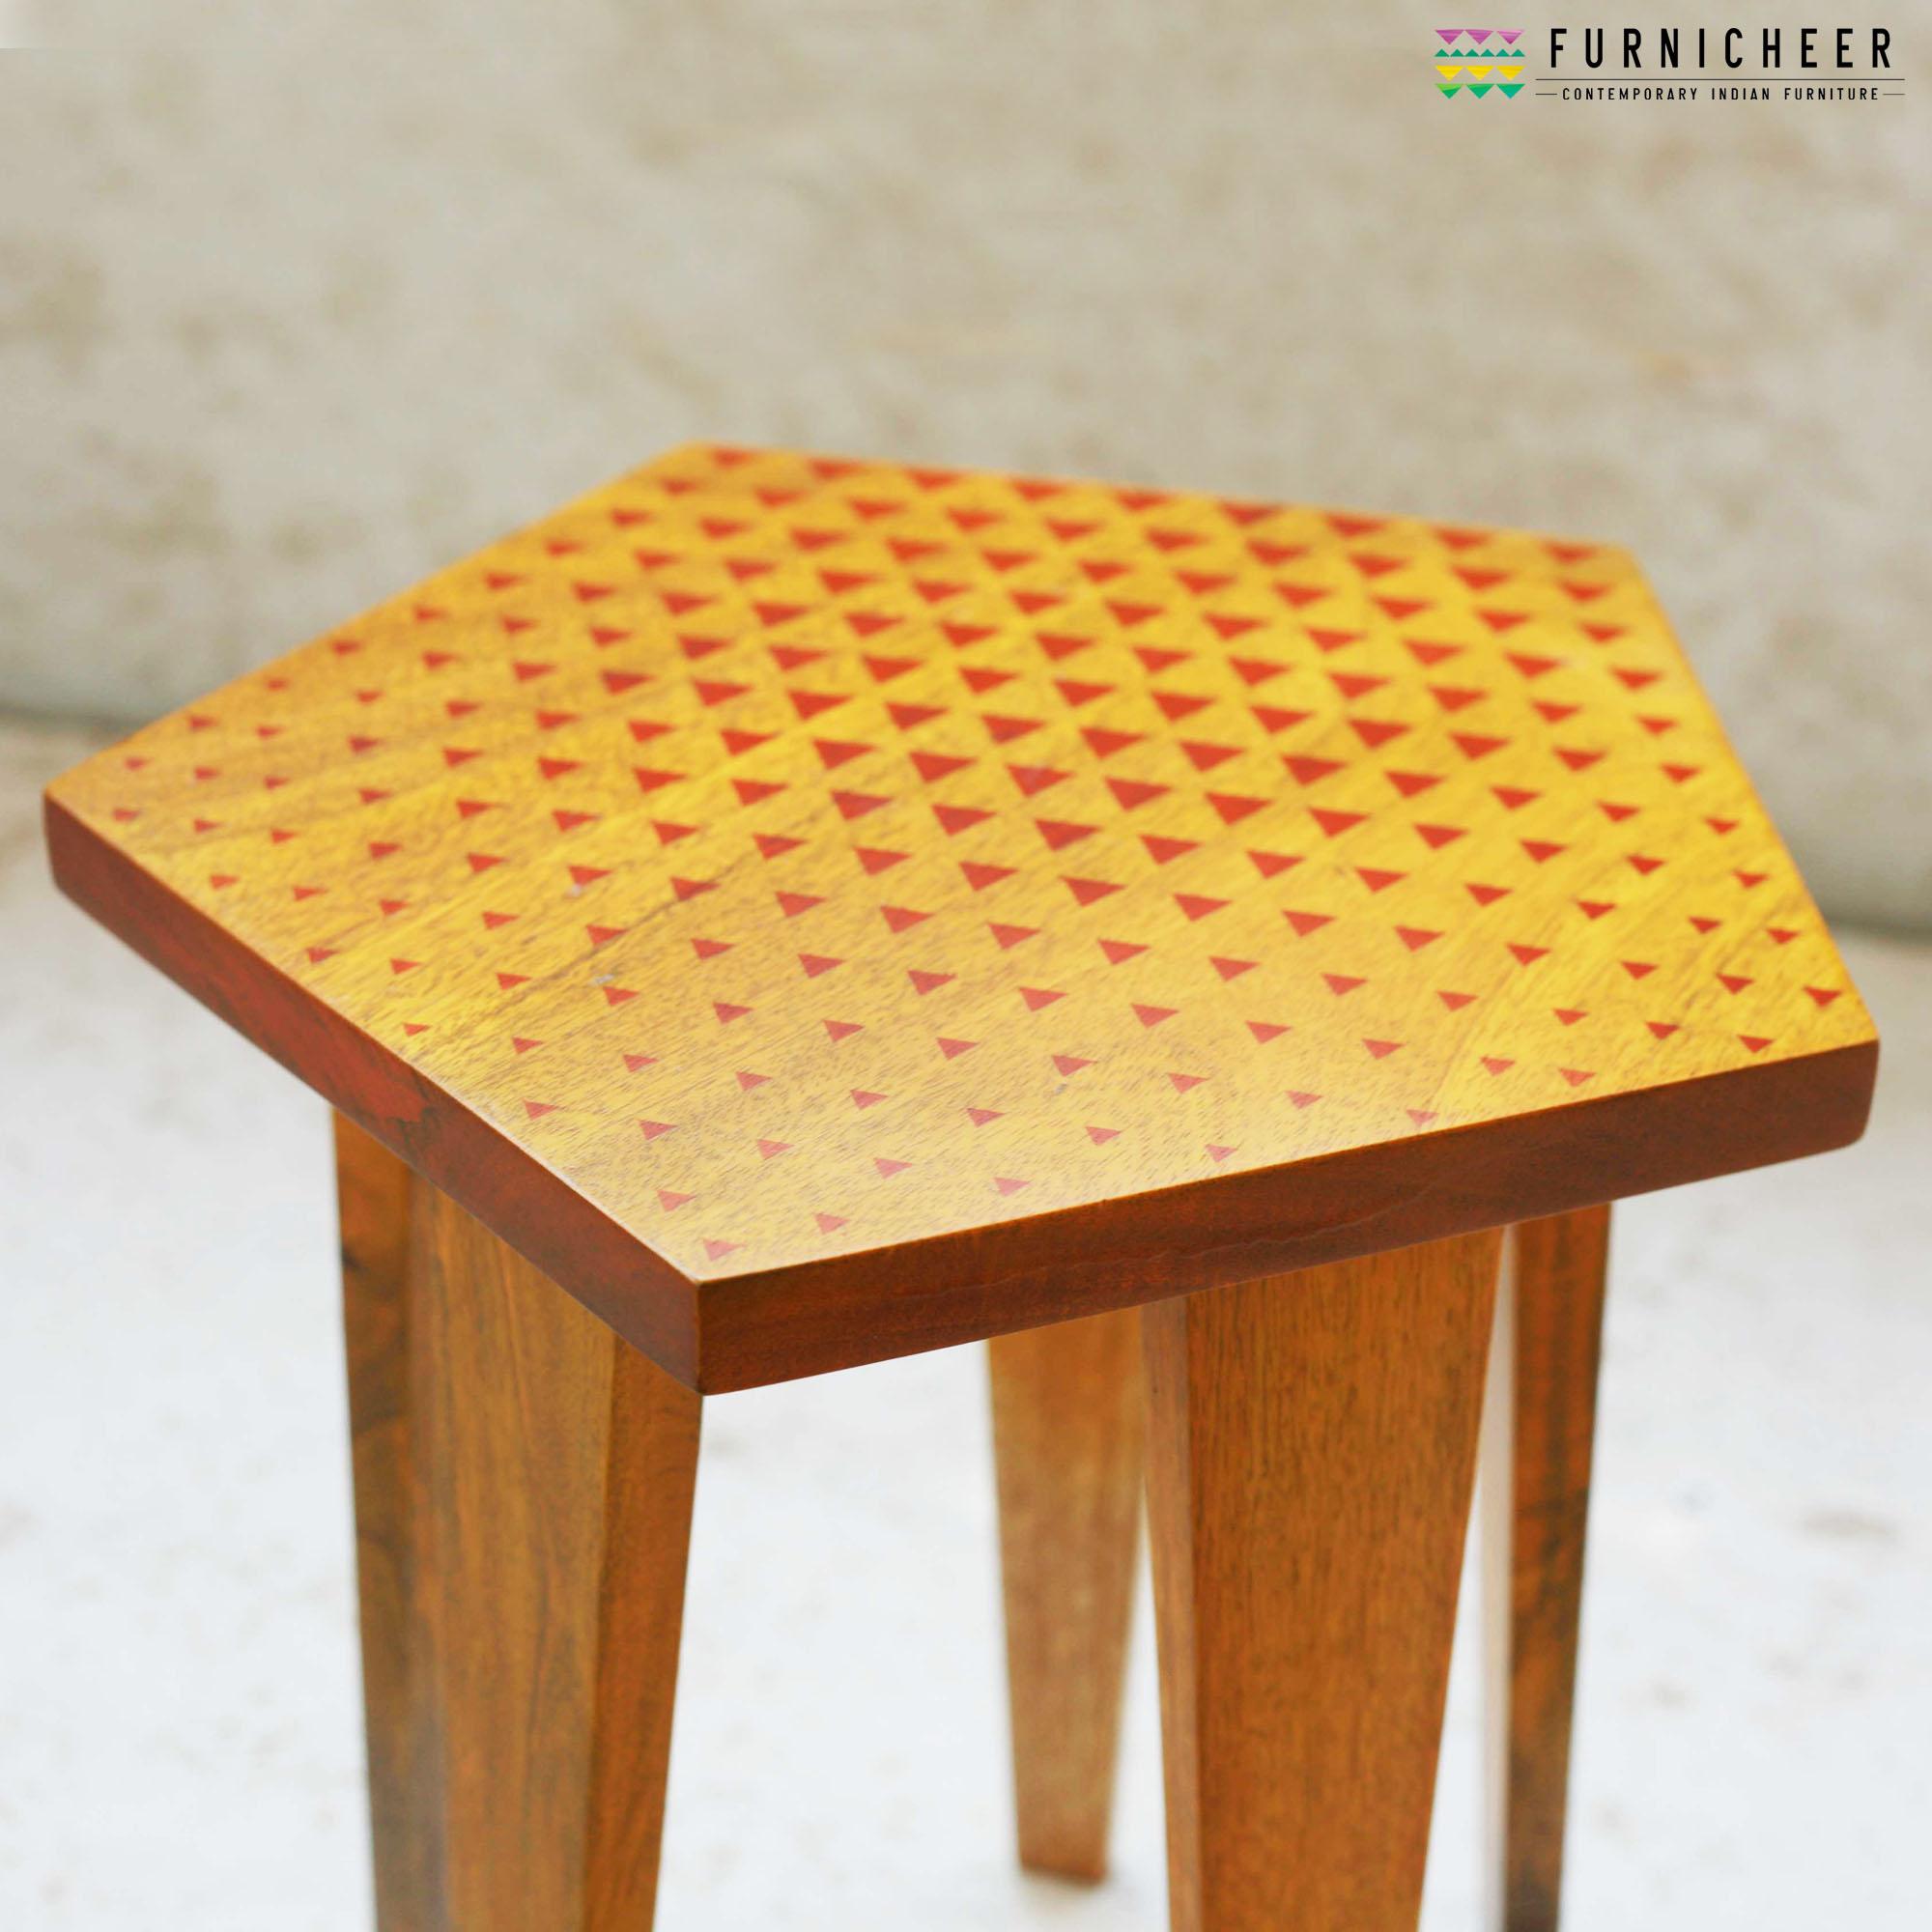 2.SIDE & END TABLE SKU TYSR0001